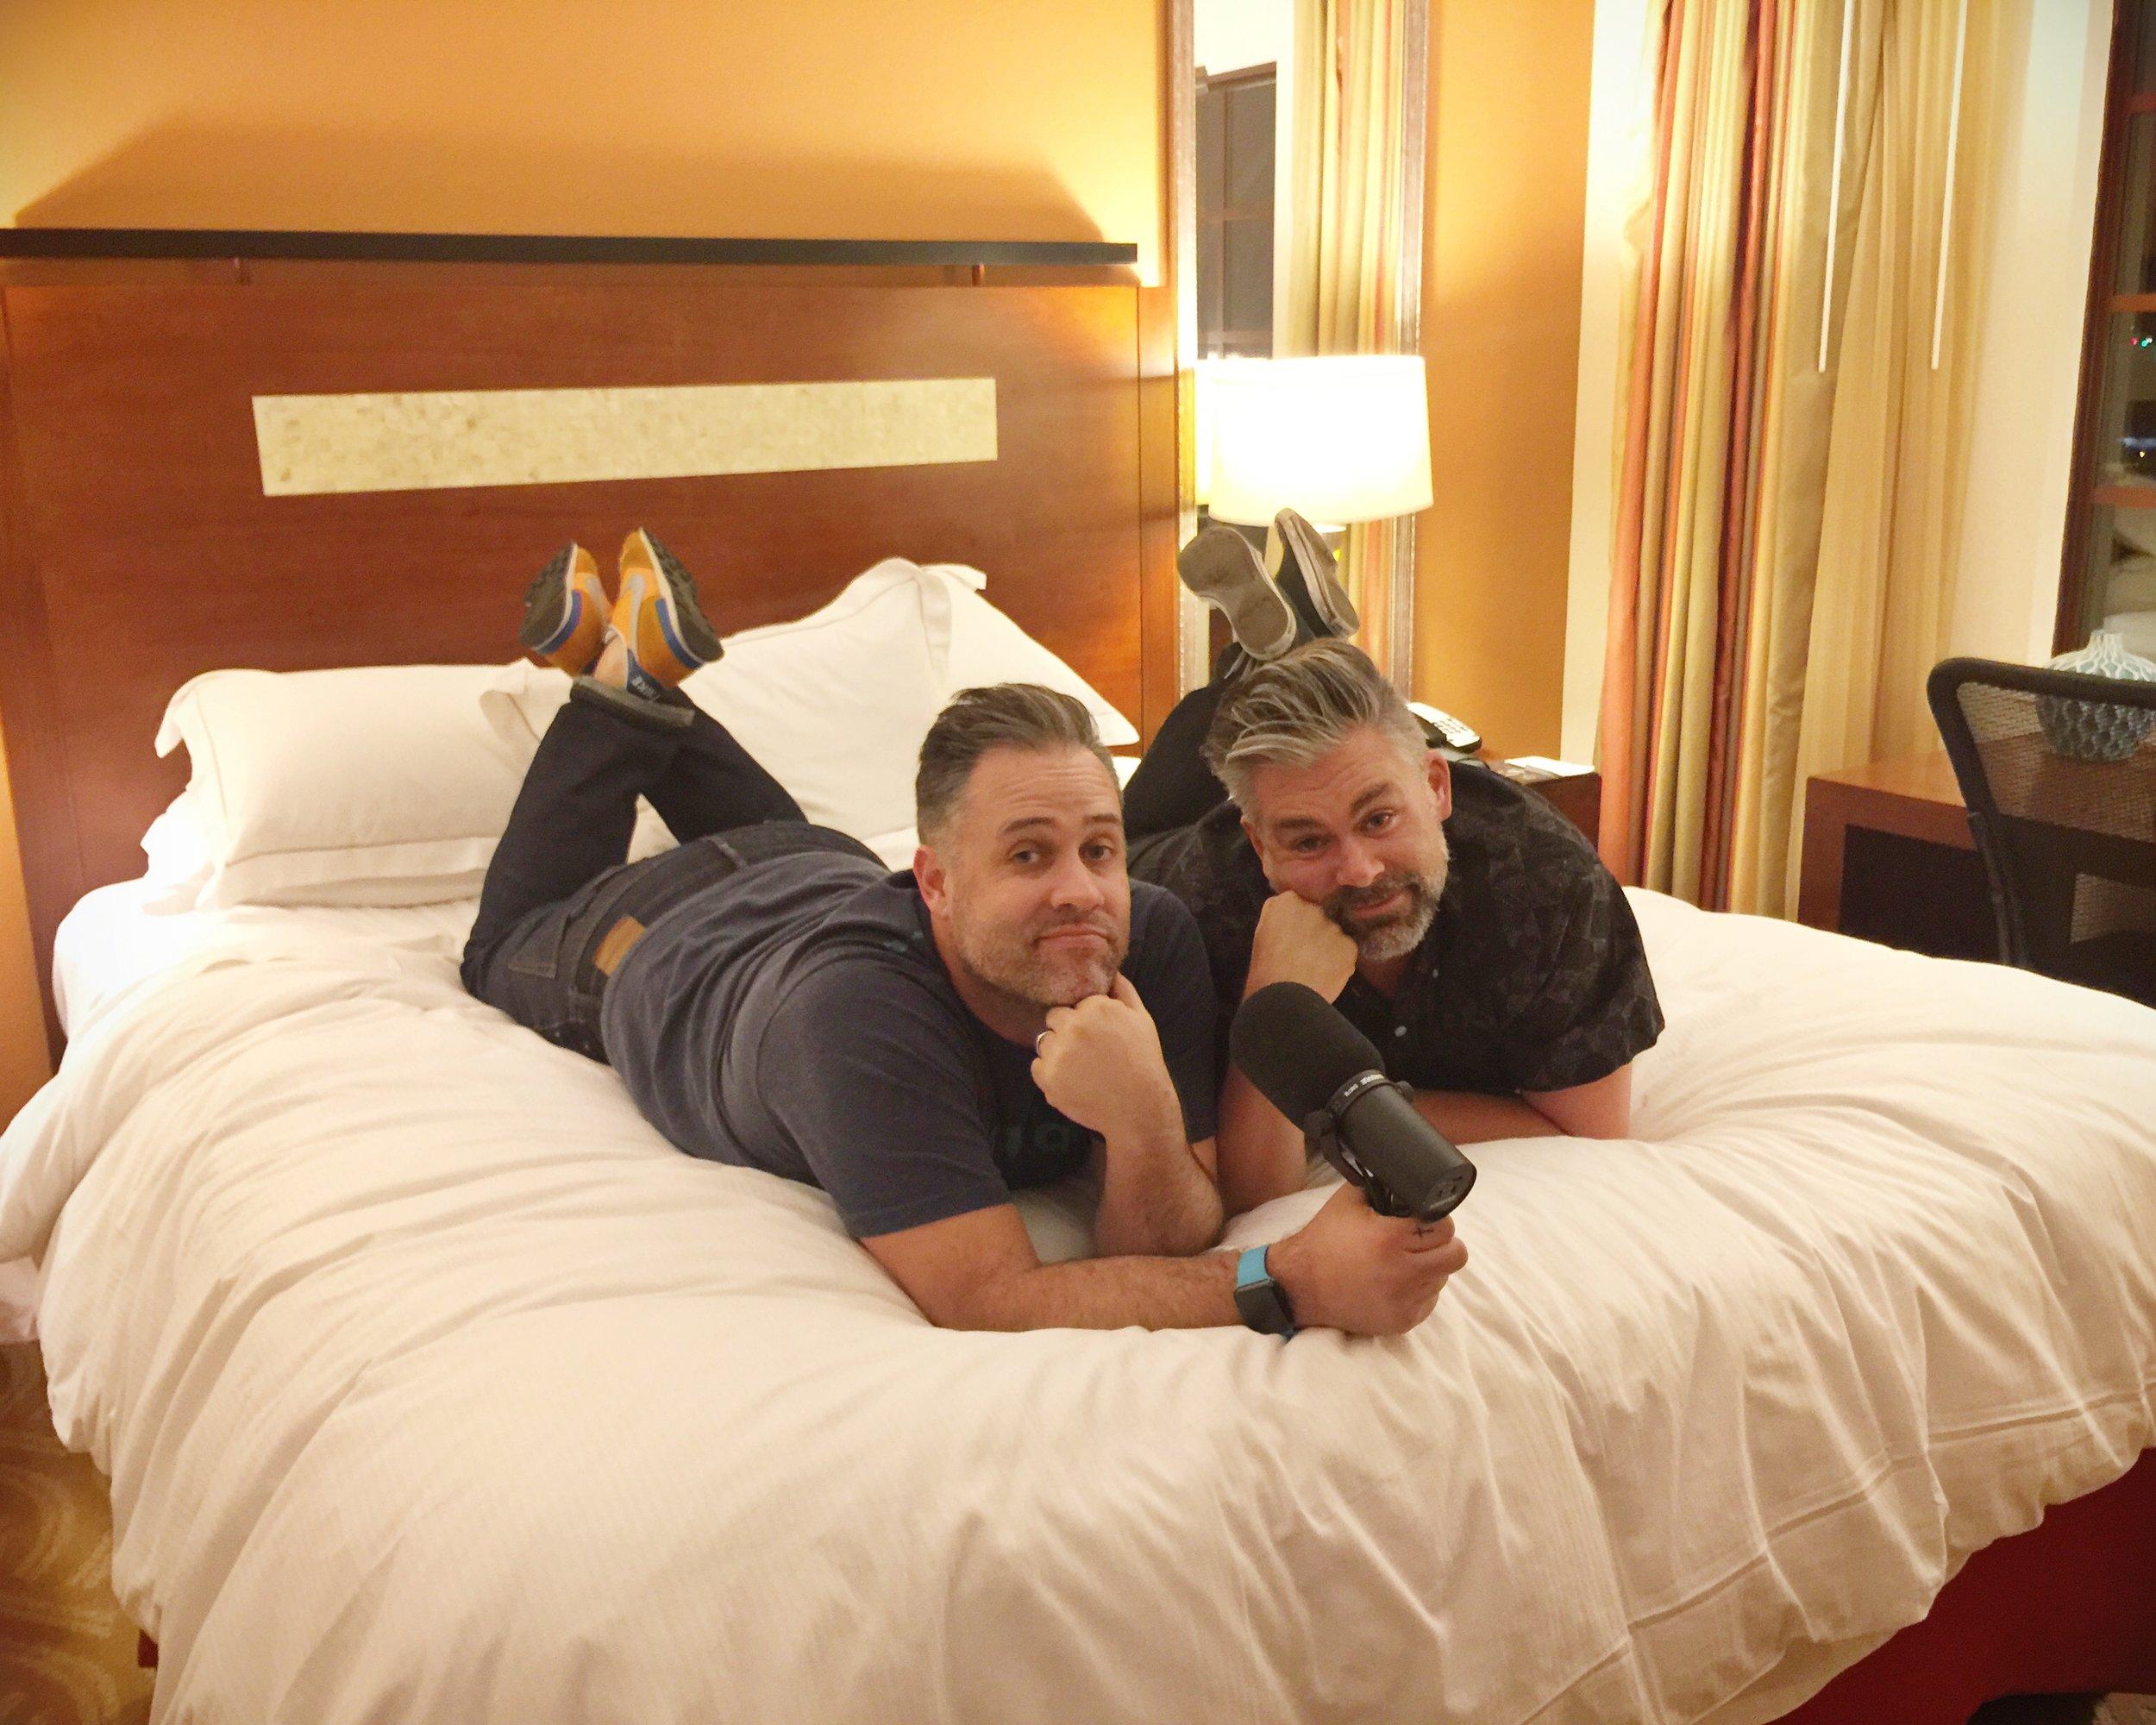 Jeff wants Matt's shoes. Matt wants Jeff's hair. Mutual love... mutual envy.